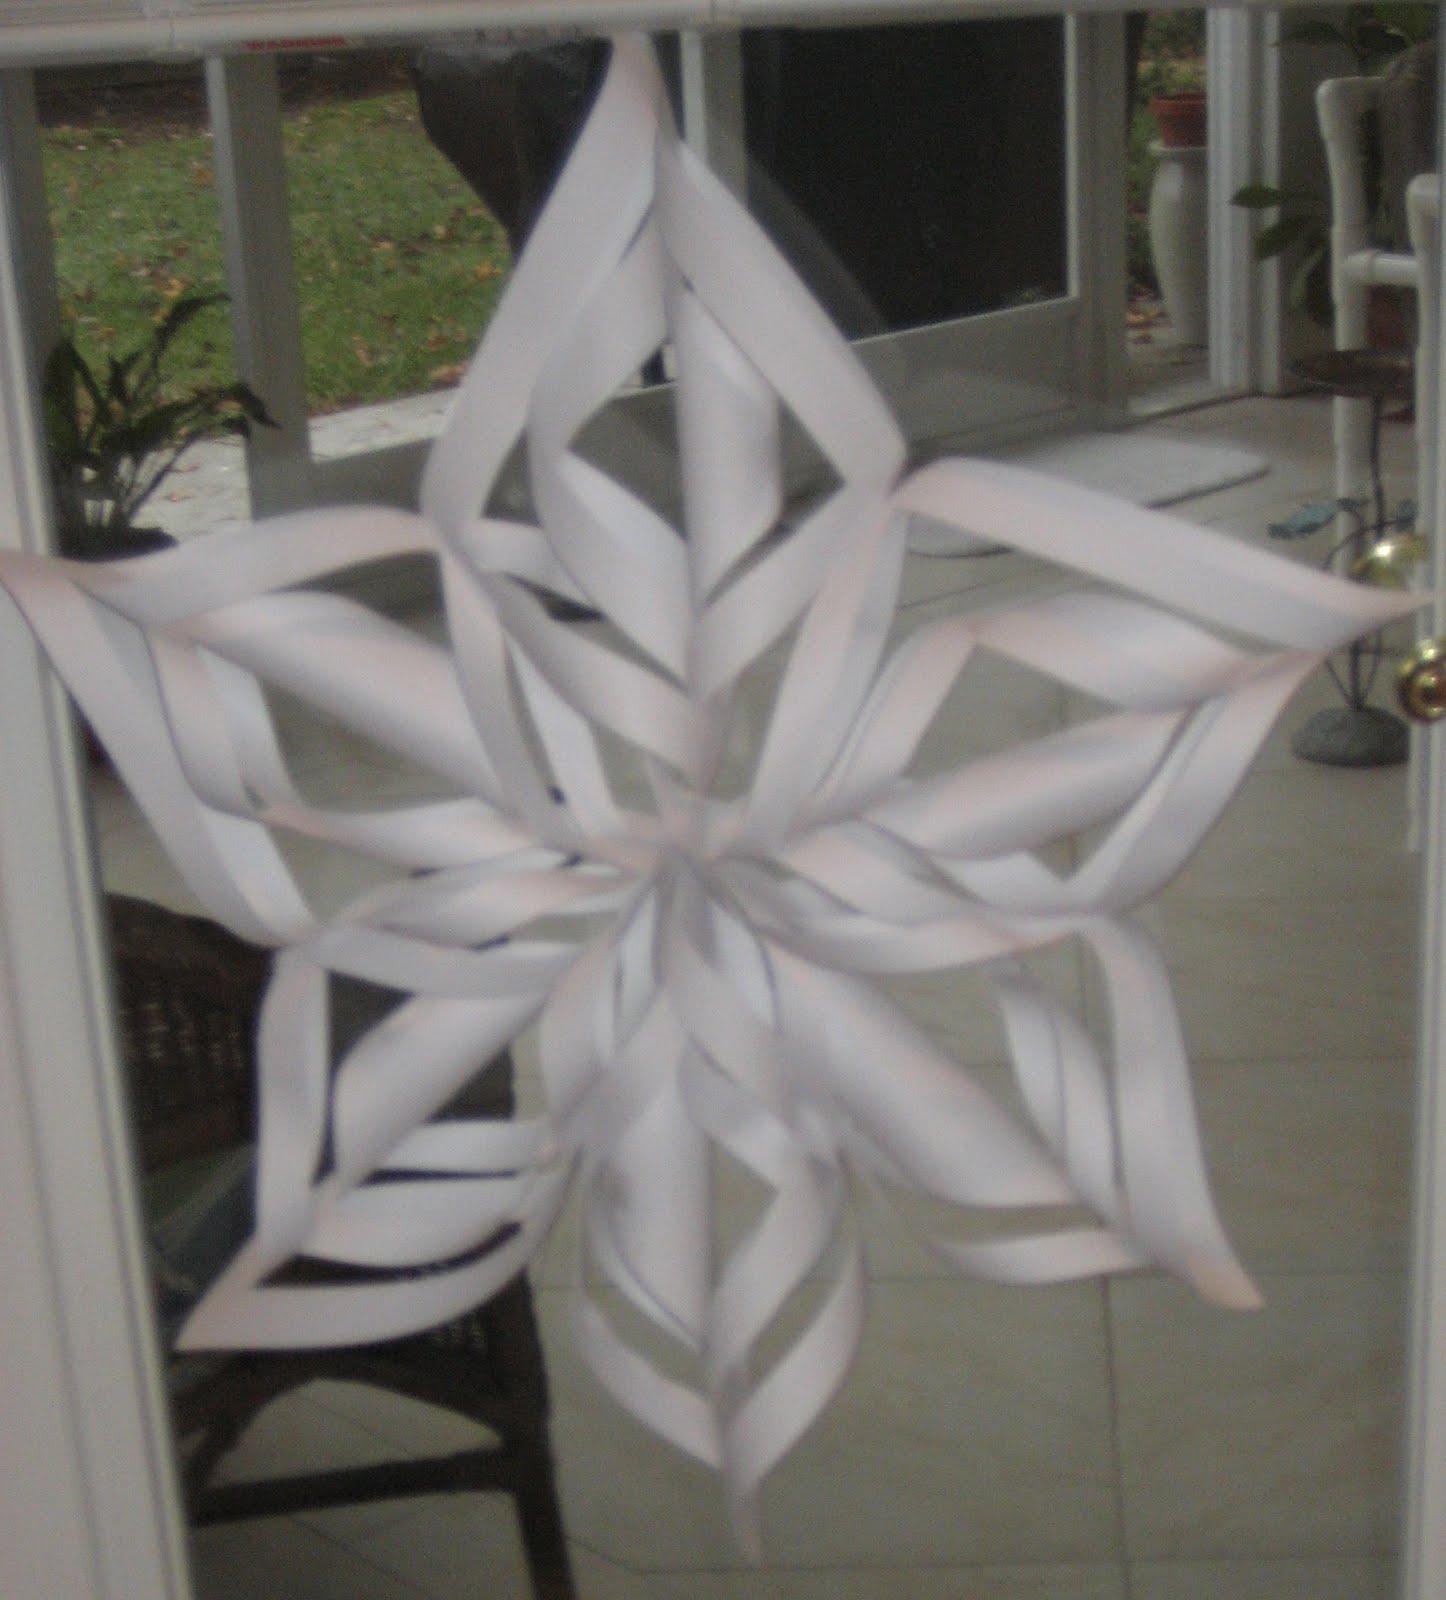 Michellan diy christmas paper snowflakes for Diy paper snowflakes 3d